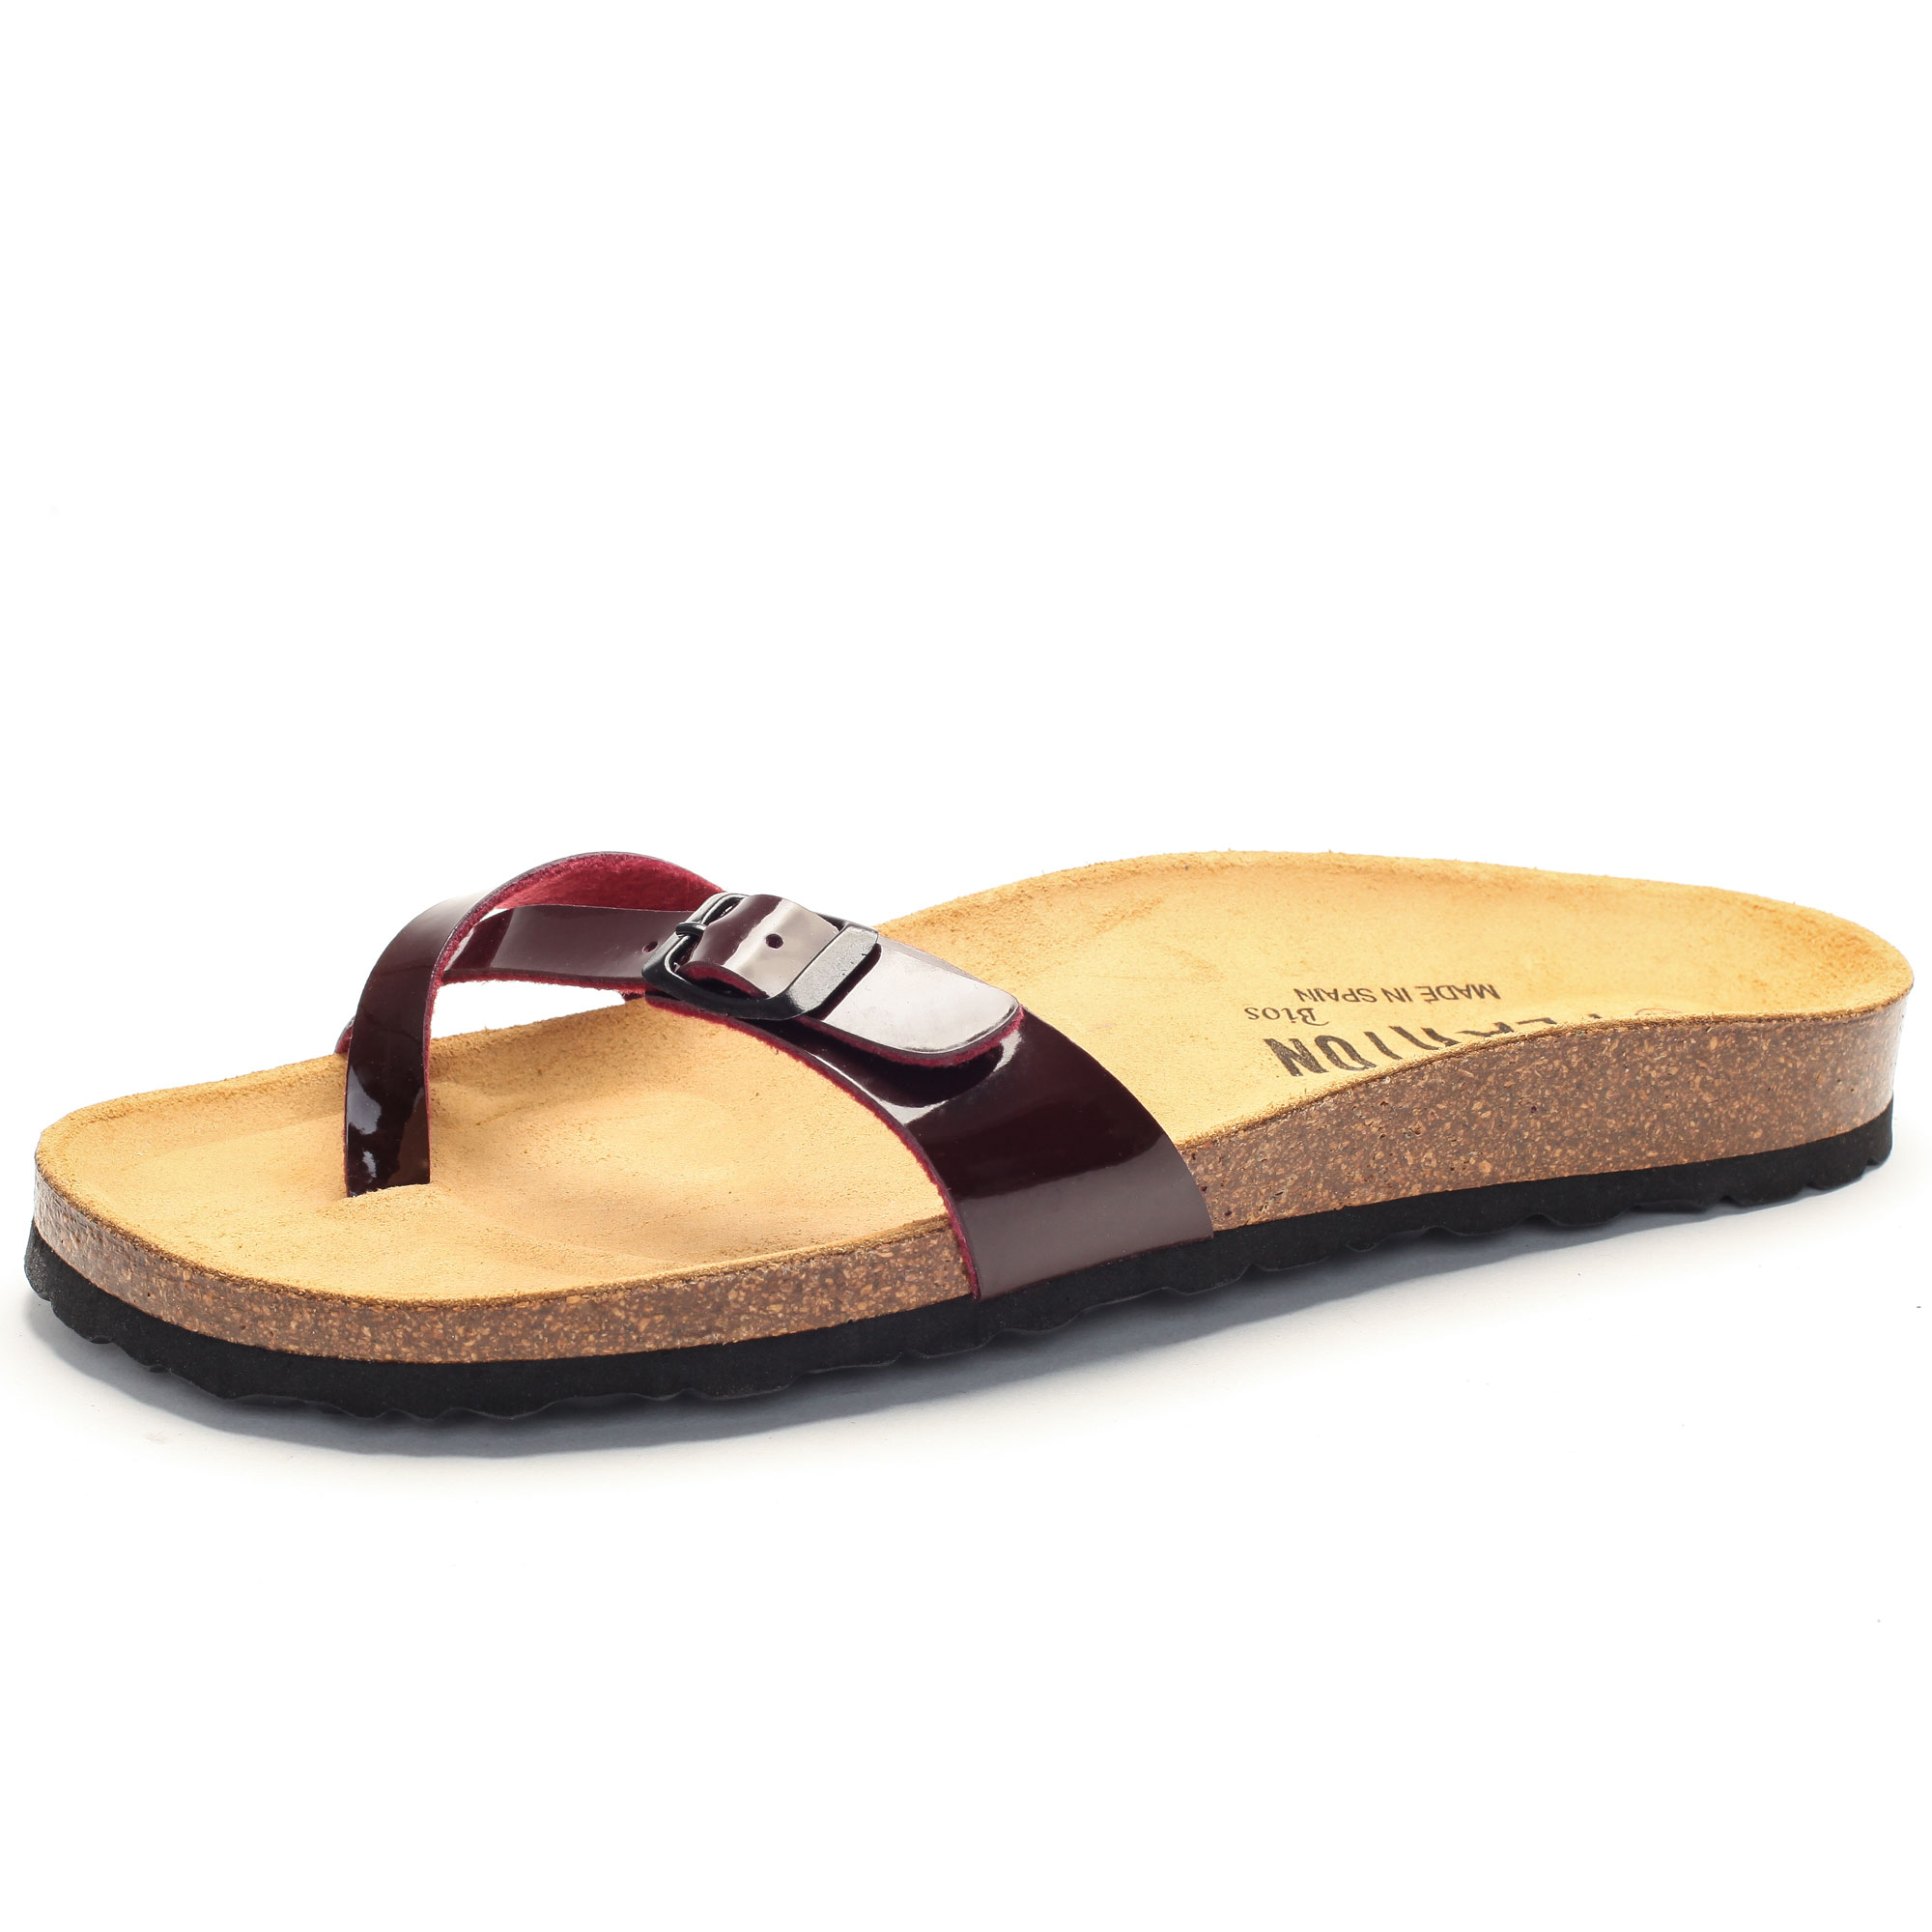 8b239cf8d458f4 Bequeme Sandale mit Zehentrenner von Plakton in bordeaux ...